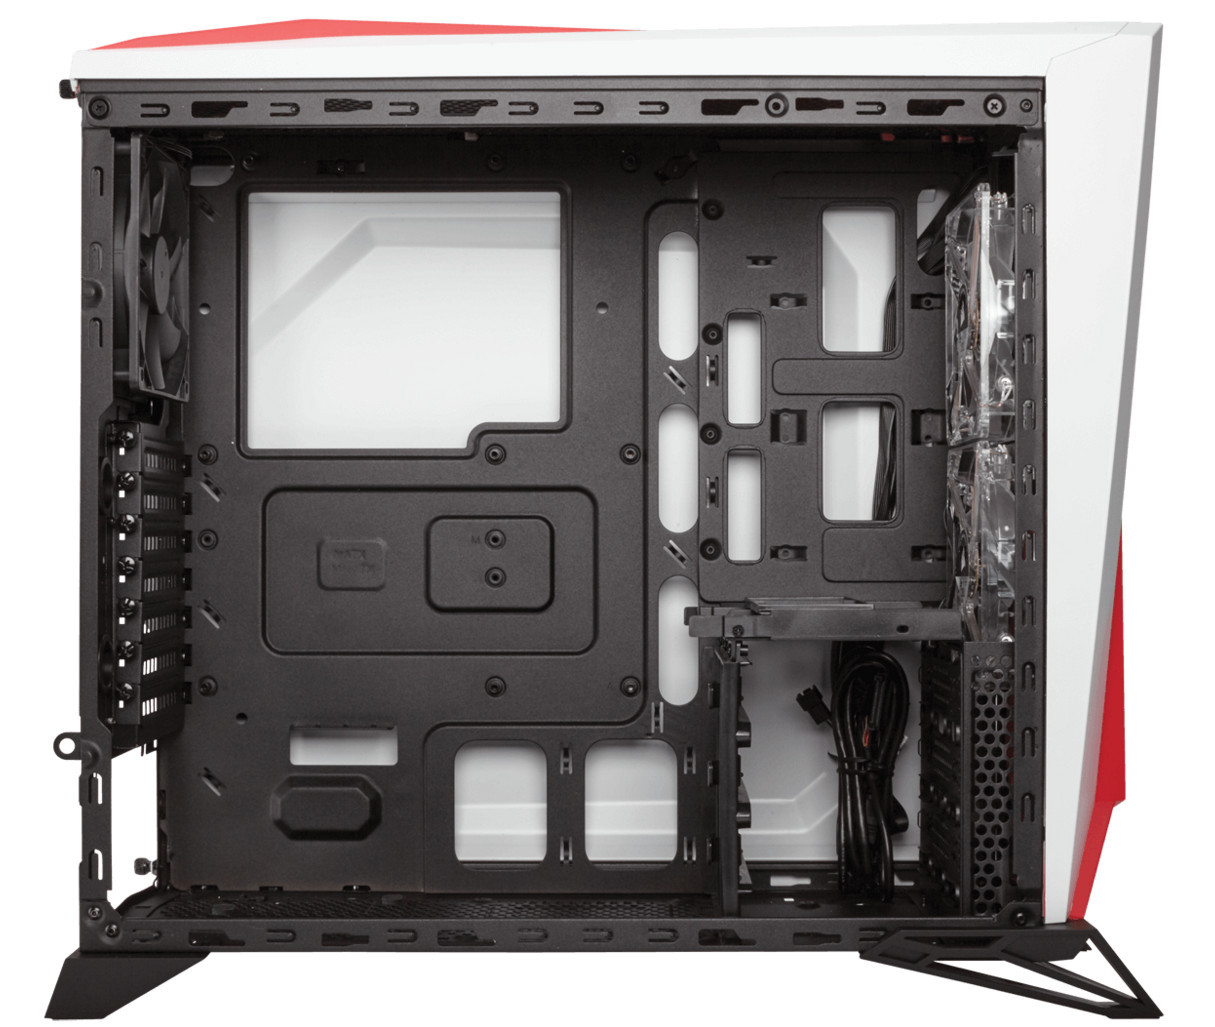 Corsair Releases The Carbide Spec Alpha Mid Tower Atx Case